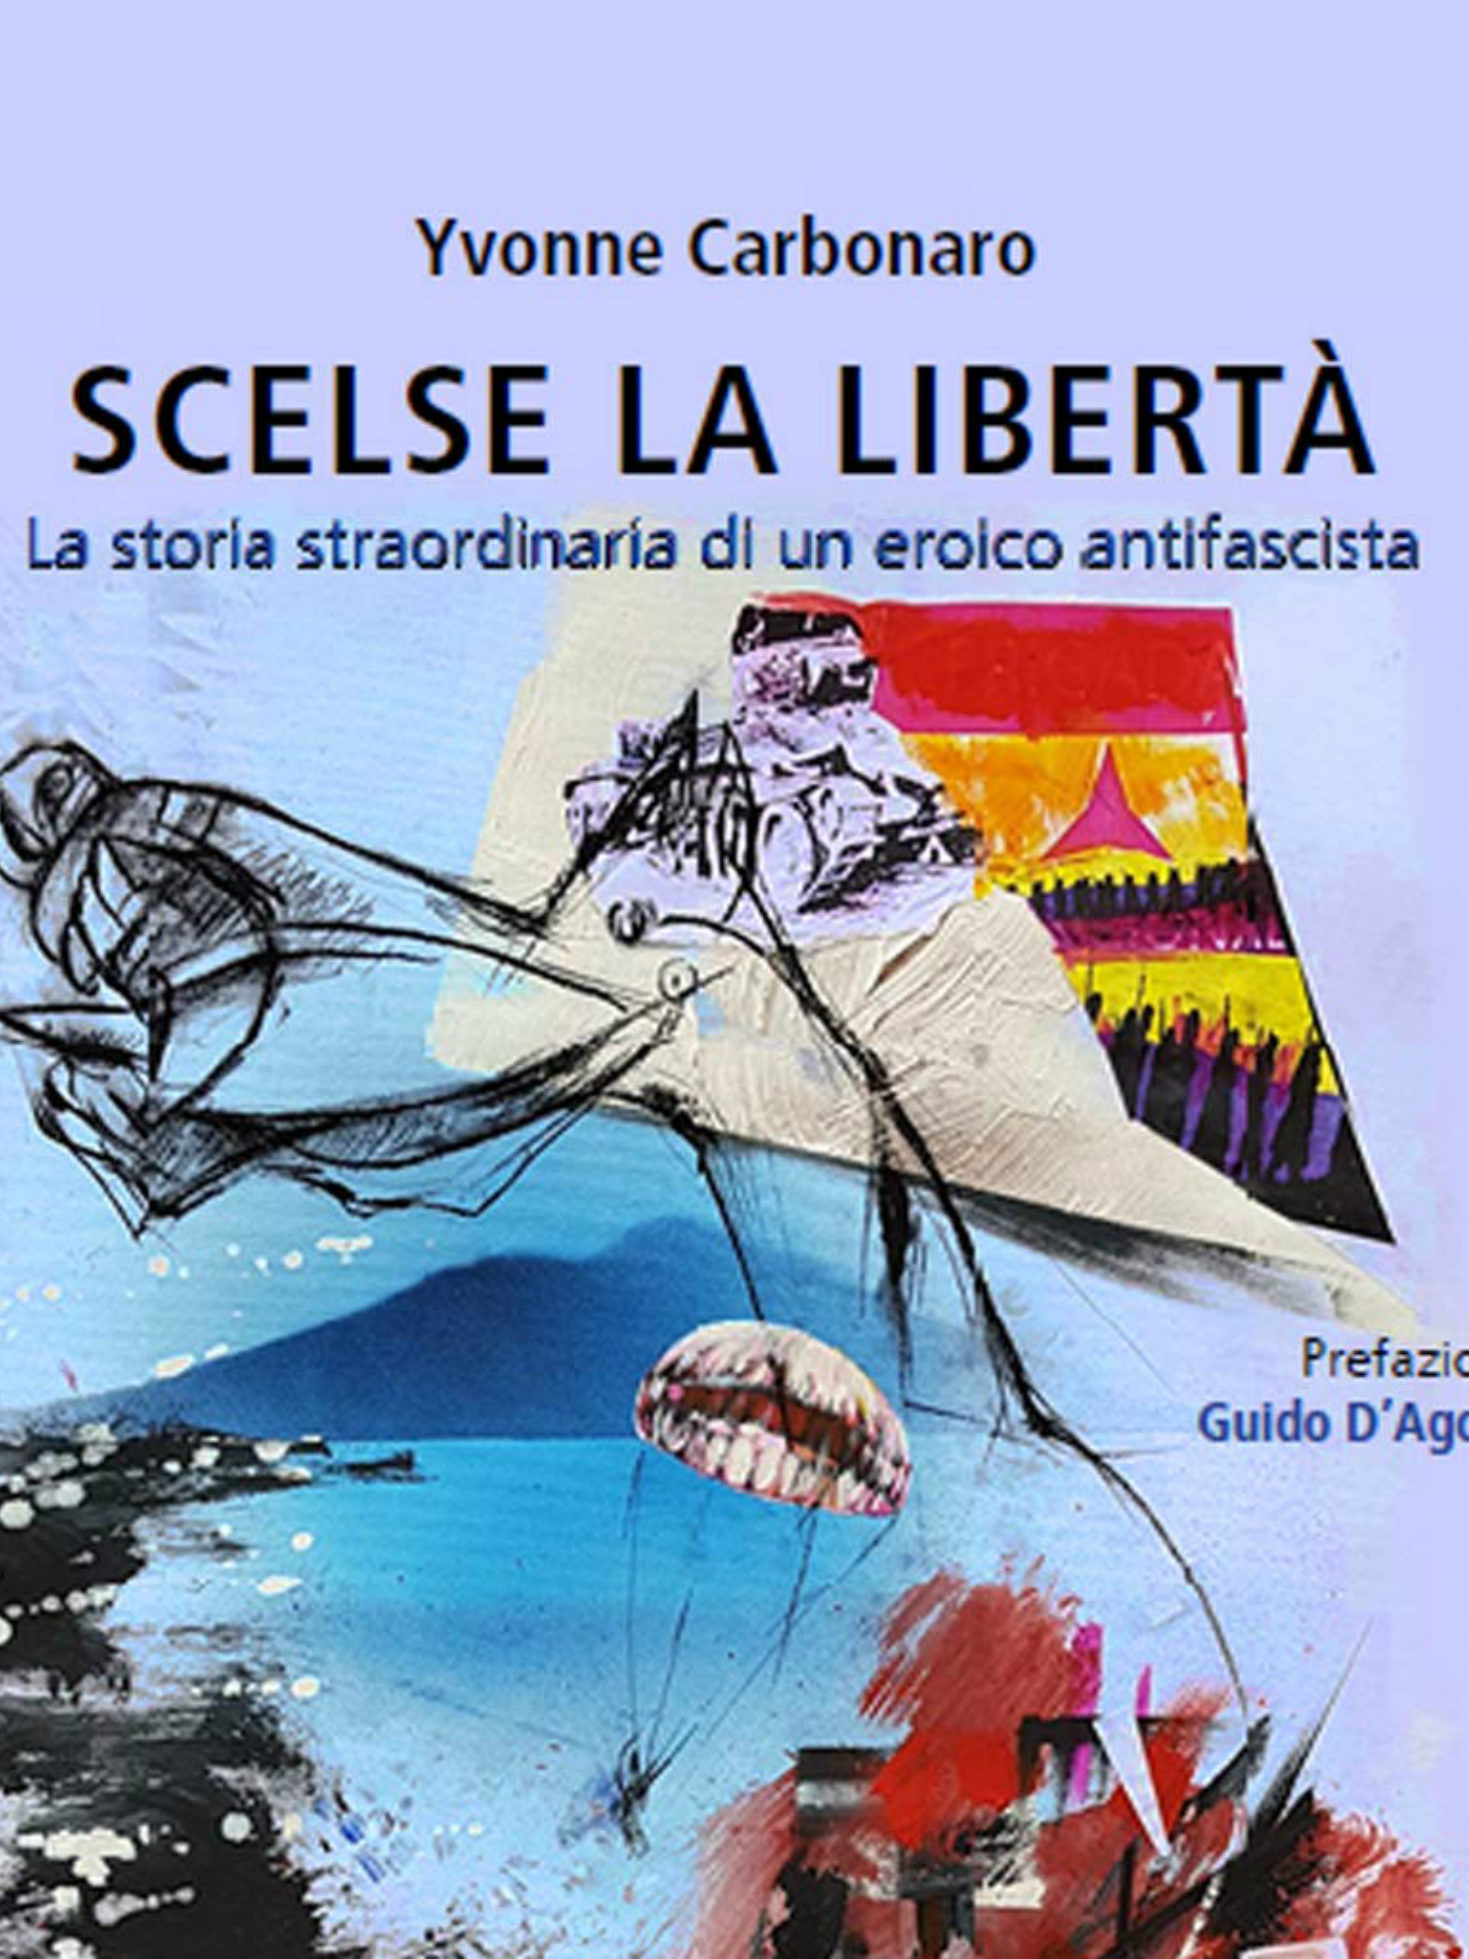 scelse la libertà; Yvonne Carbonaro